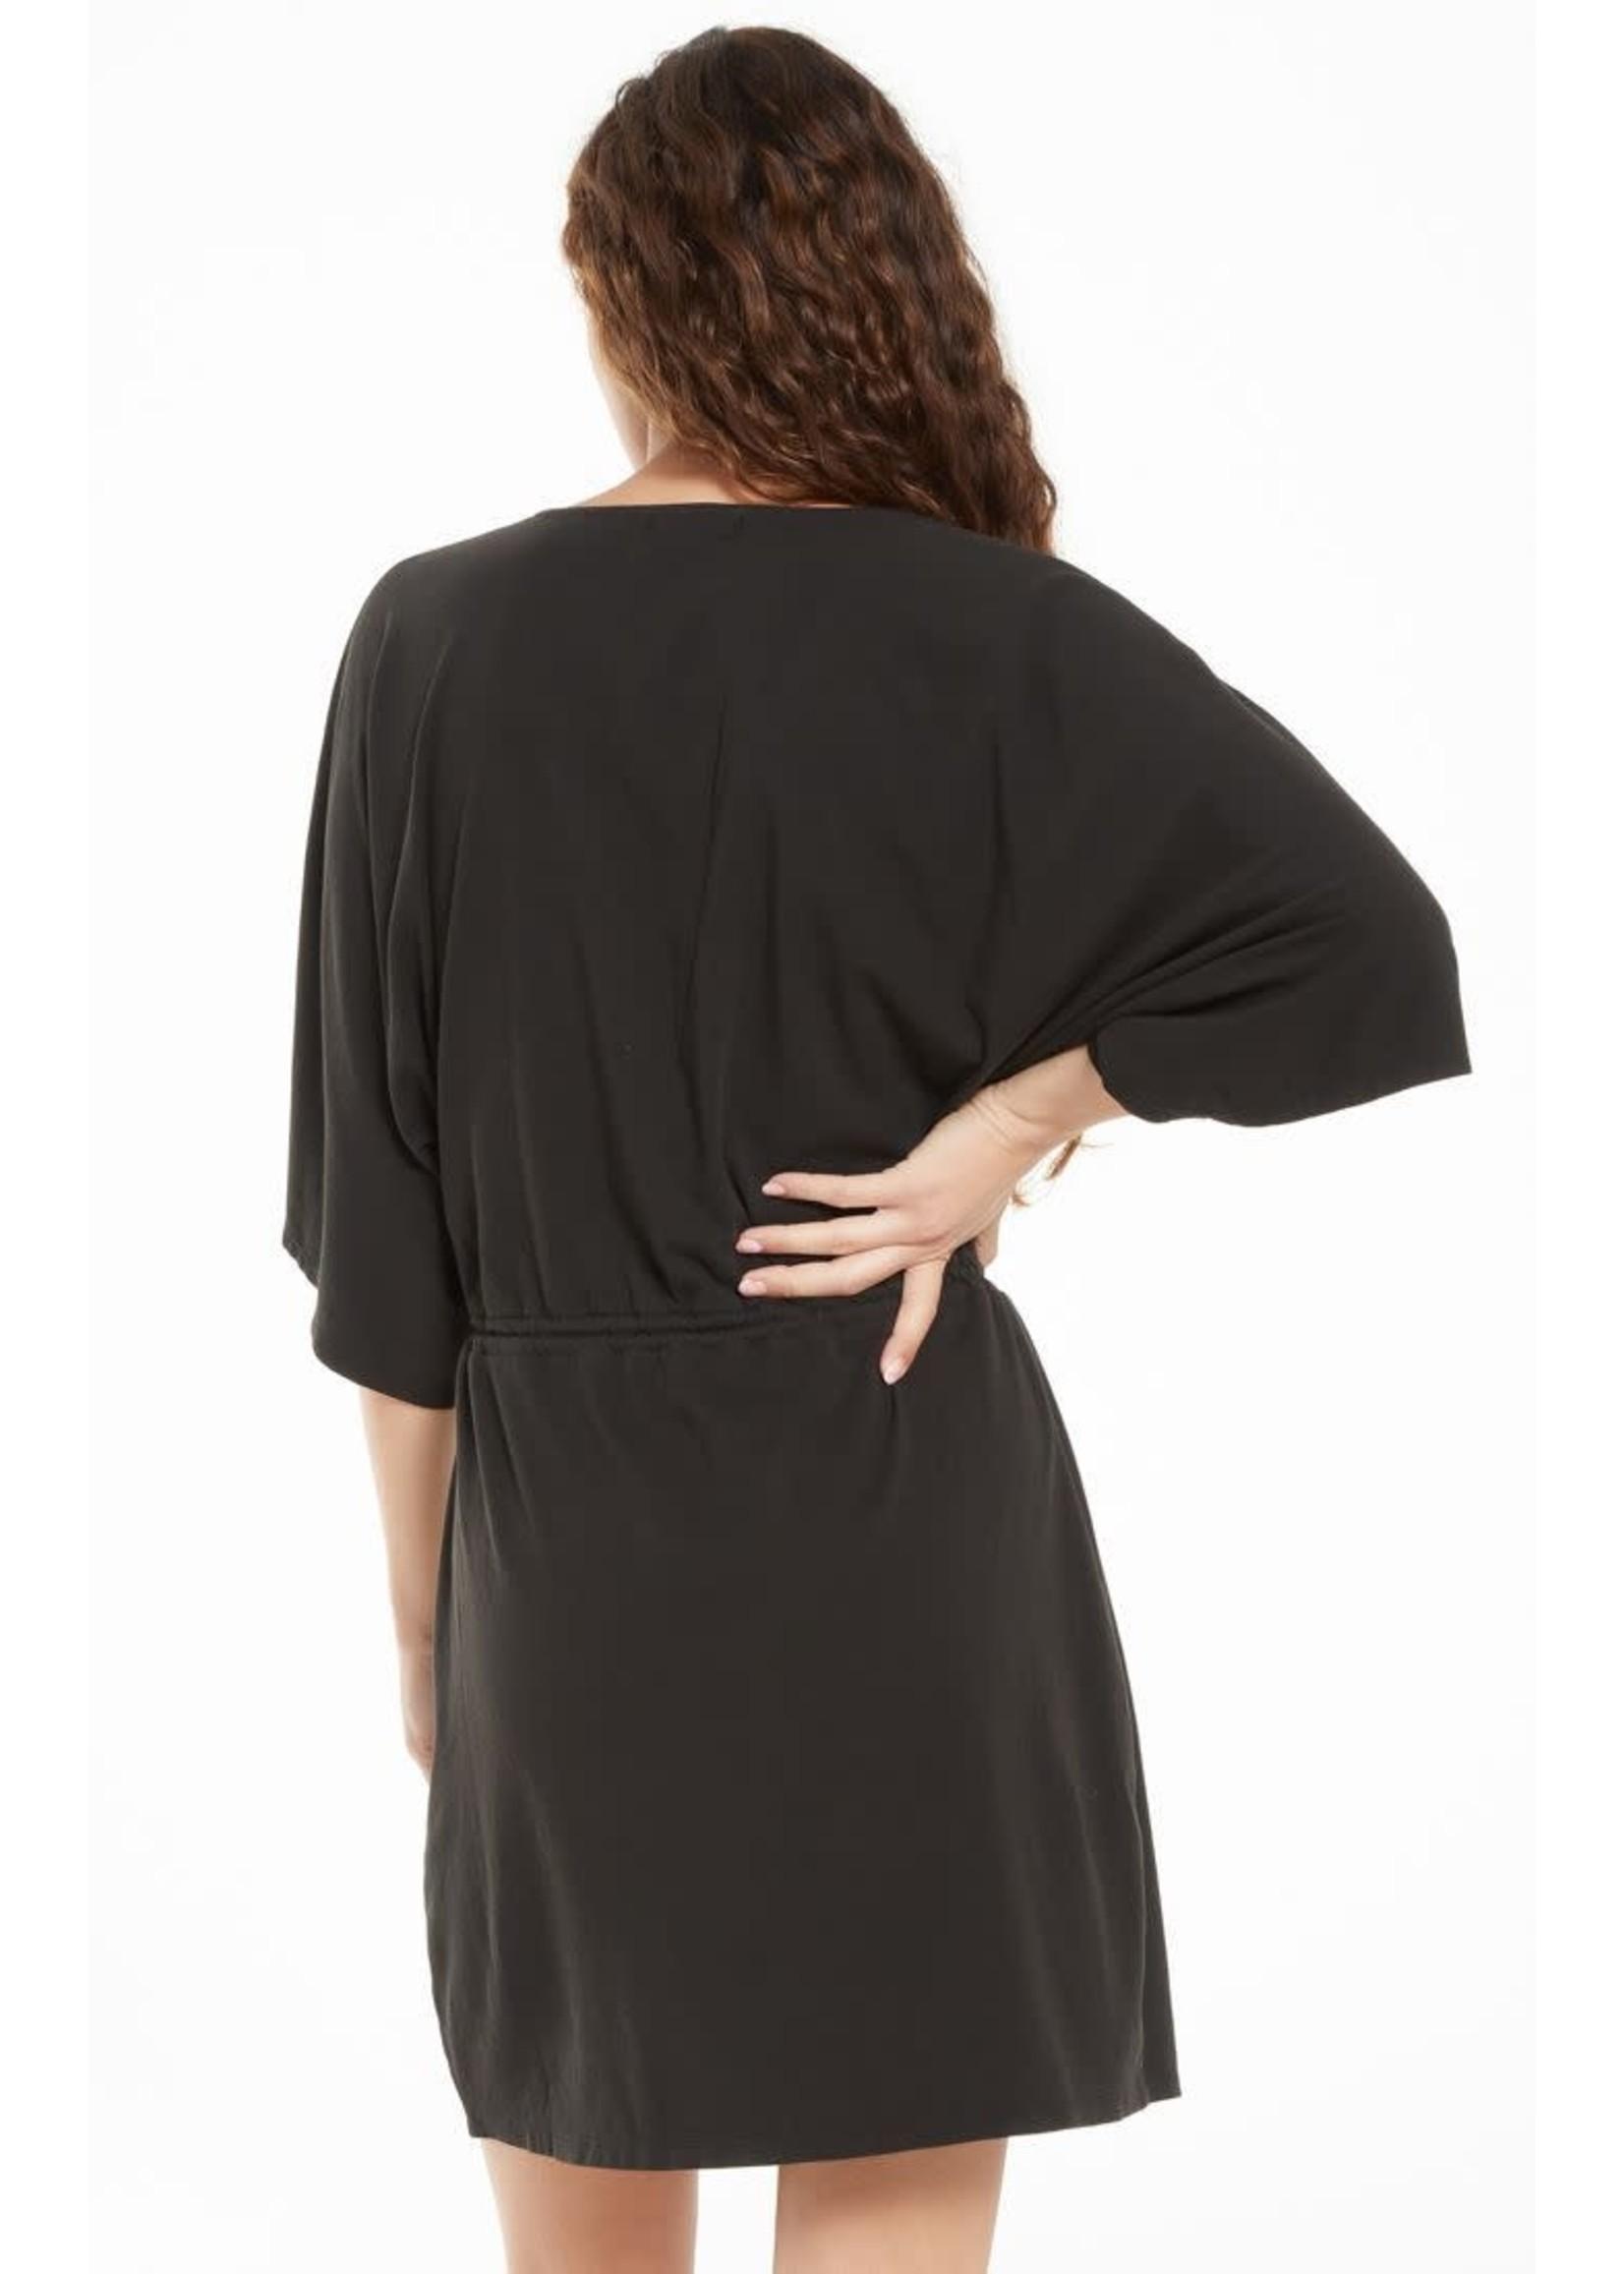 Z Supply Sydney Dress